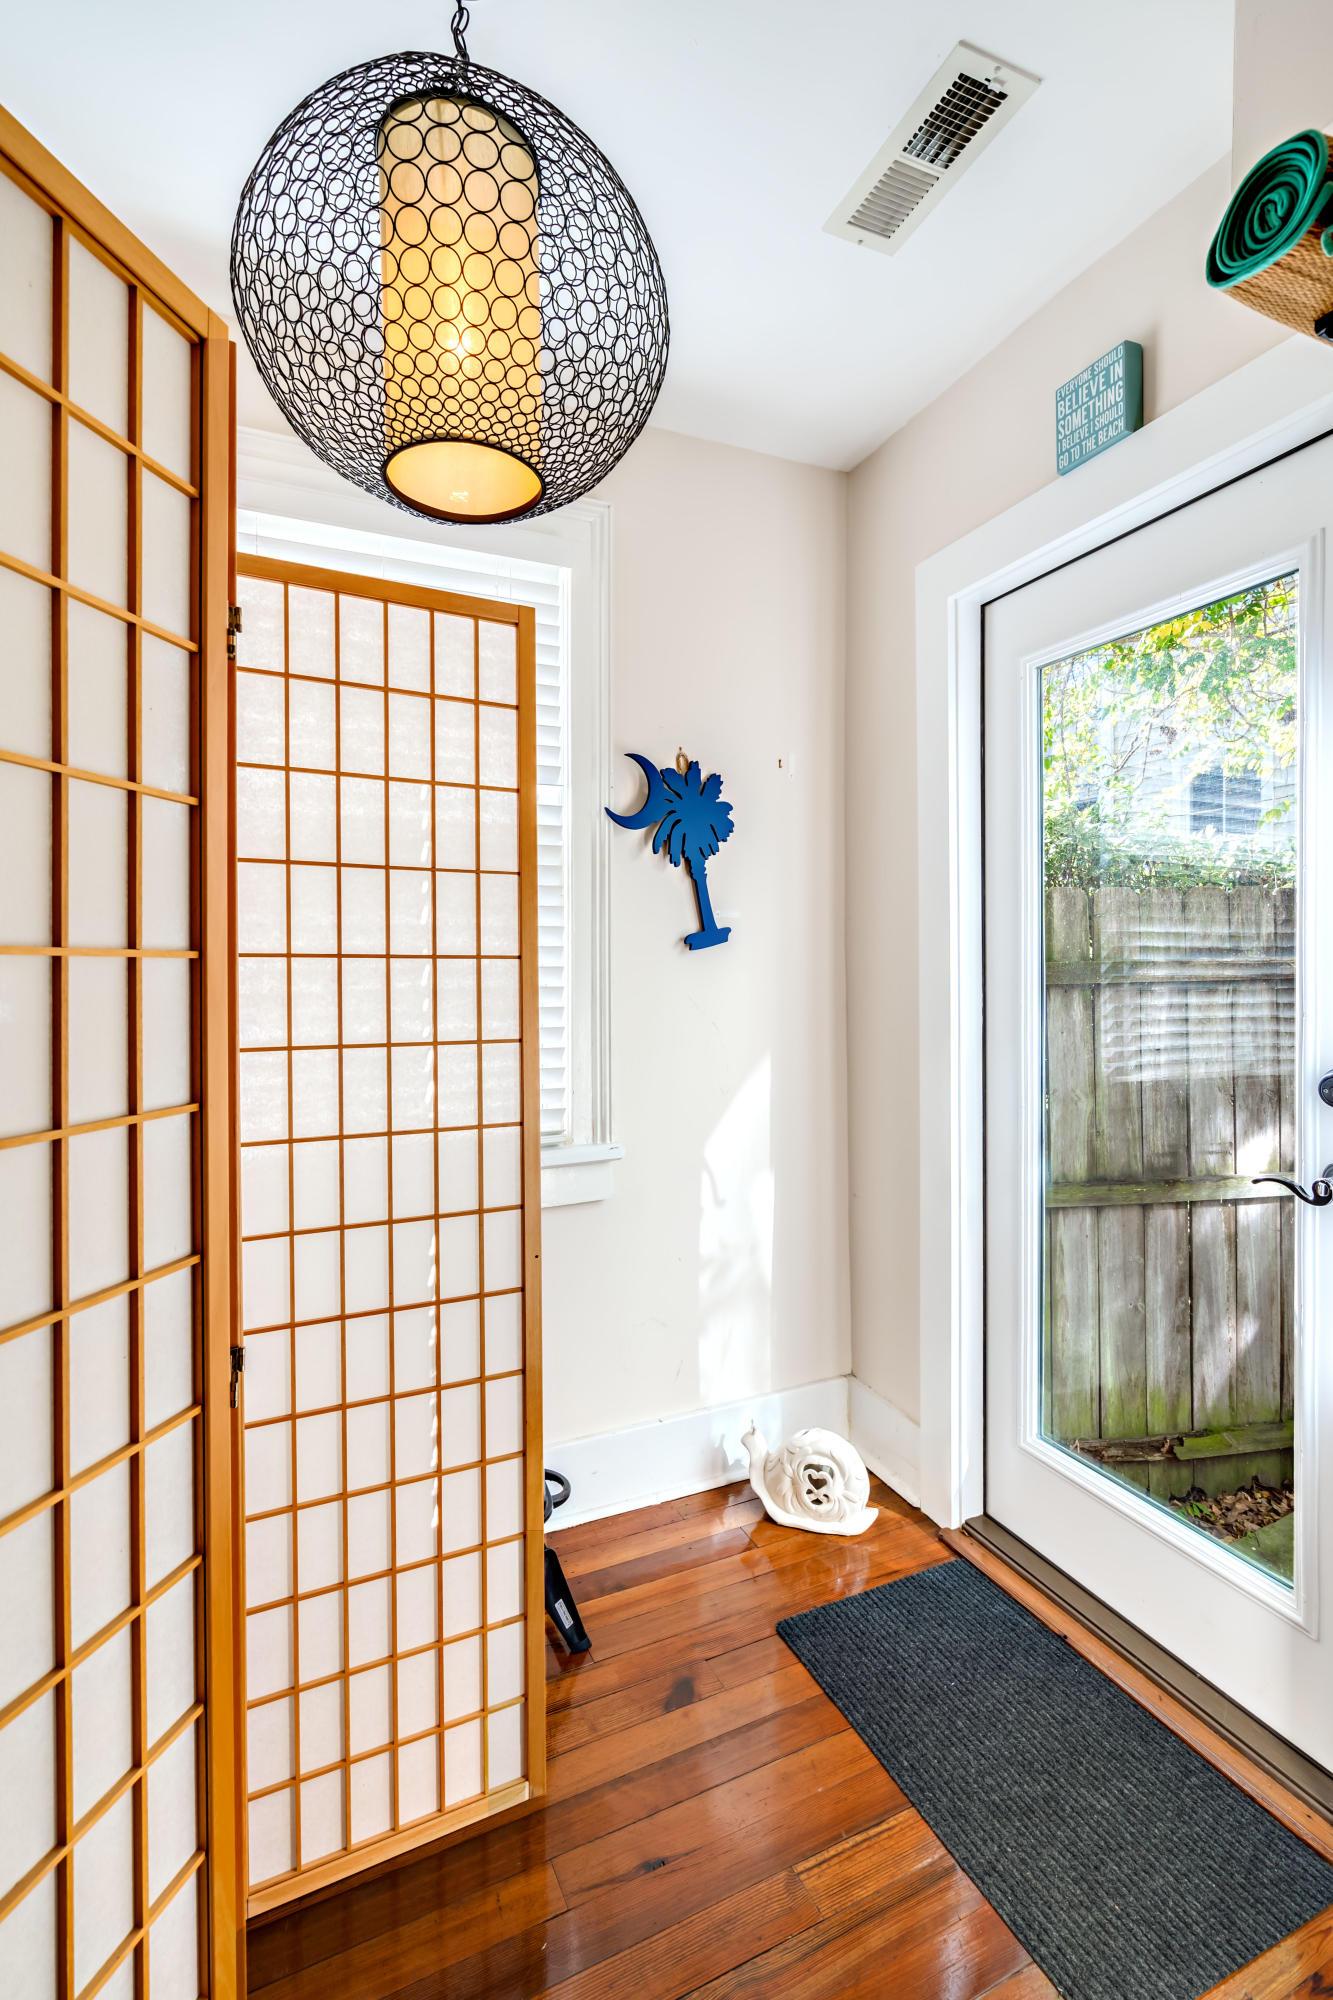 Cannonborough-Elliottborough Homes For Sale - 251 Ashley, Charleston, SC - 0